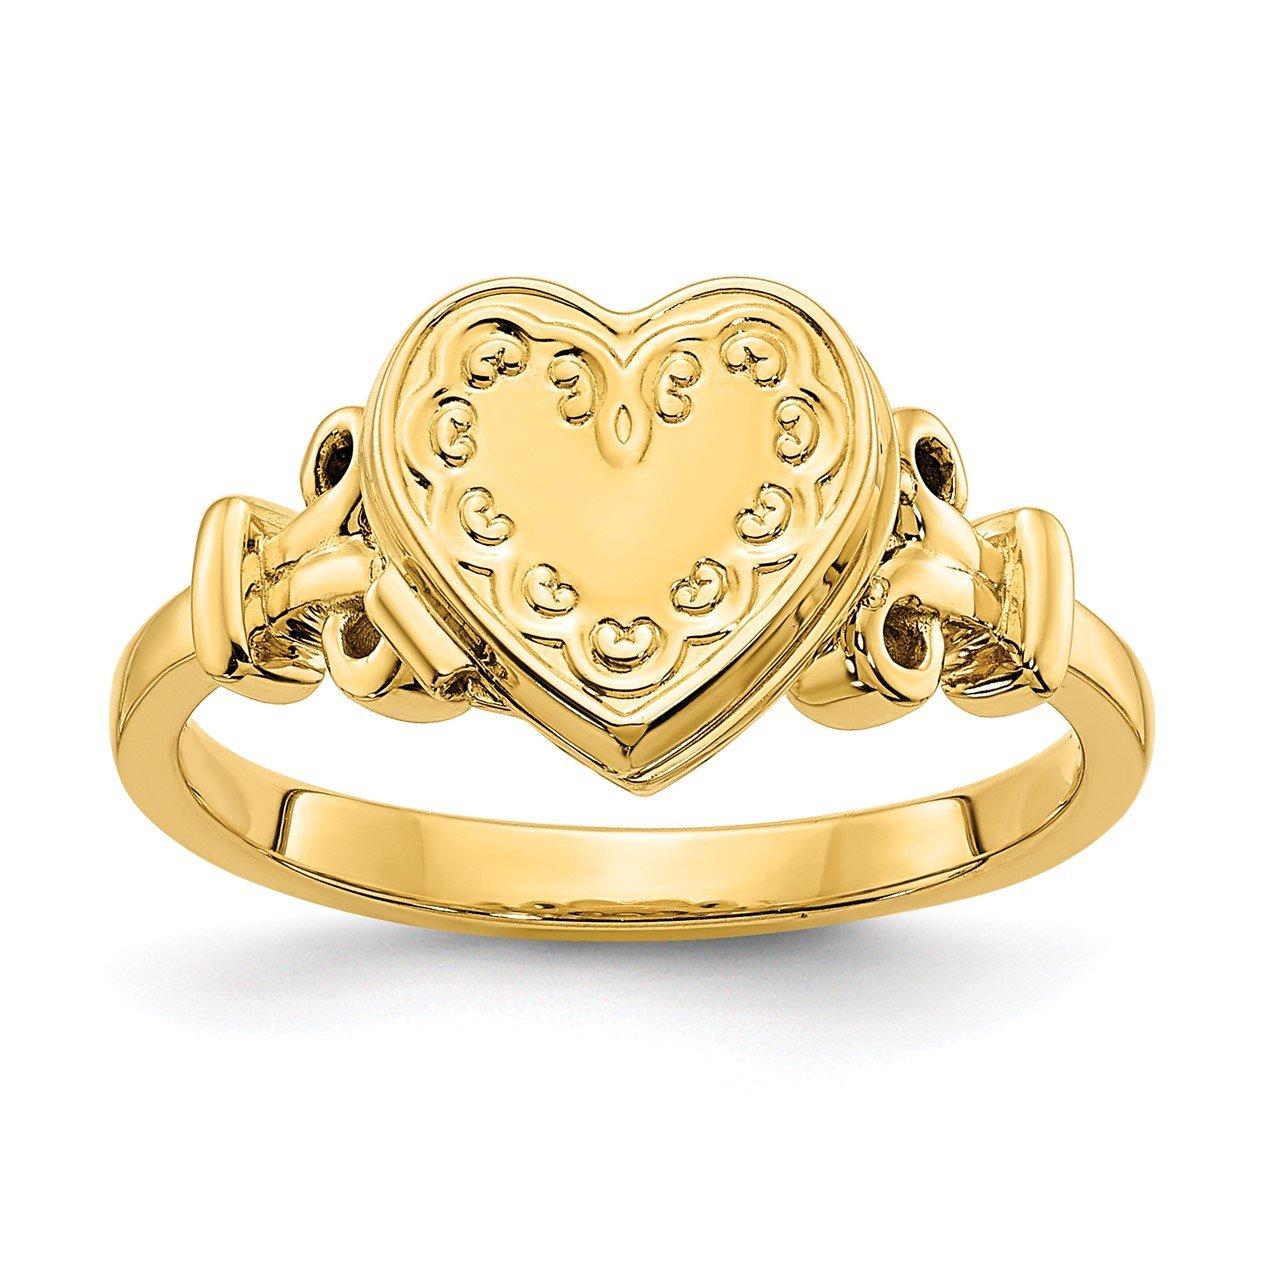 14ky 10mm Heart Shaped (8x8mm Photos) Locket Ring